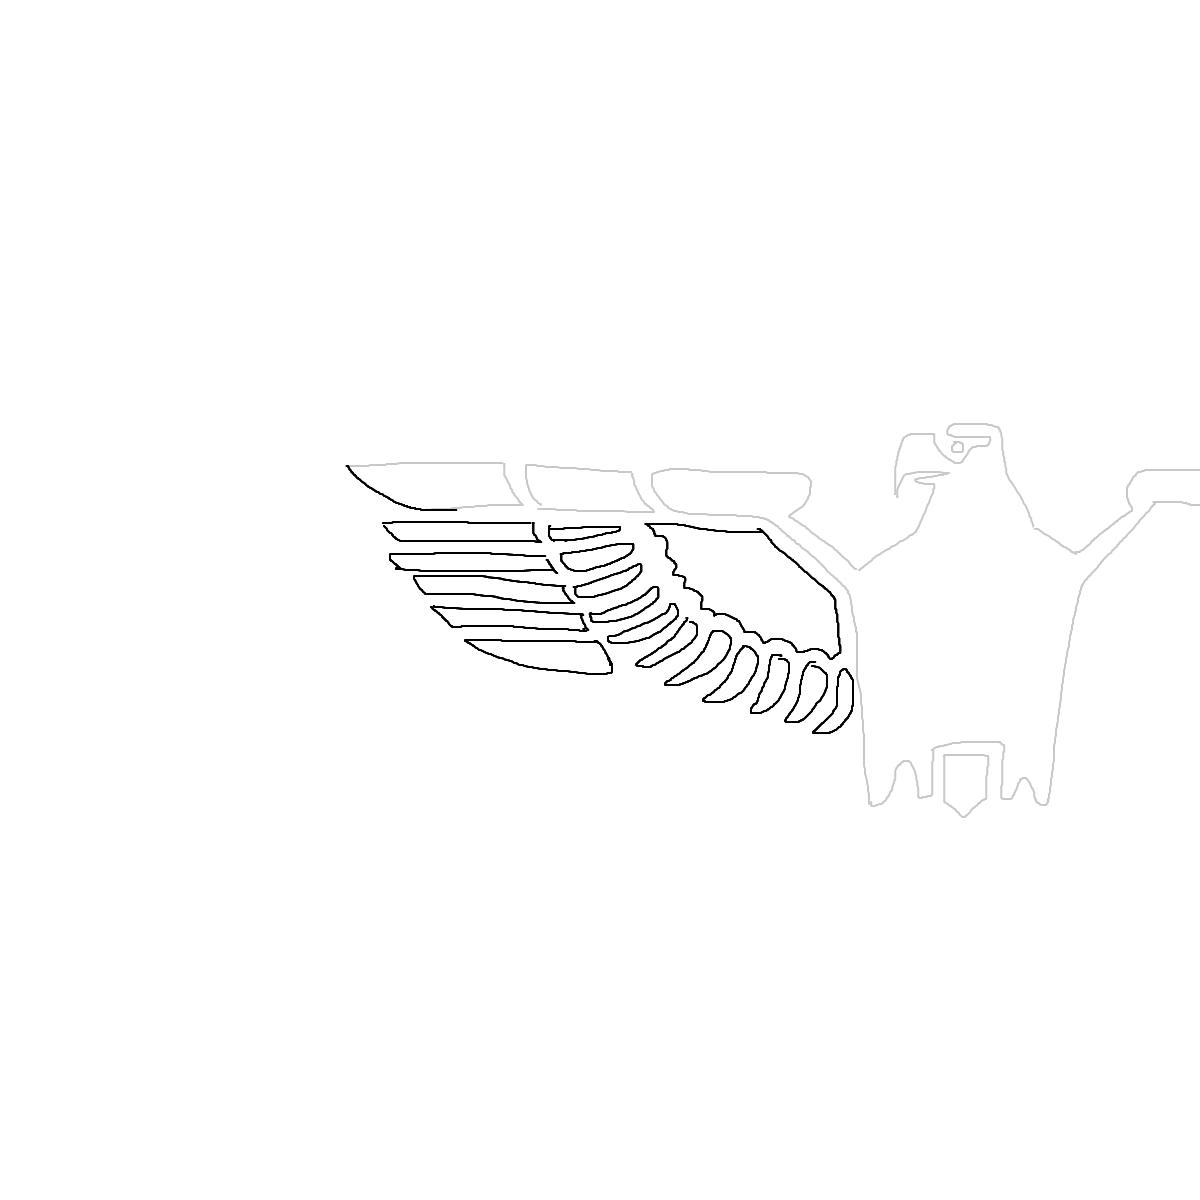 BAAAM drawing#19130 lat:60.3900756835937500lng: 25.6670837402343750